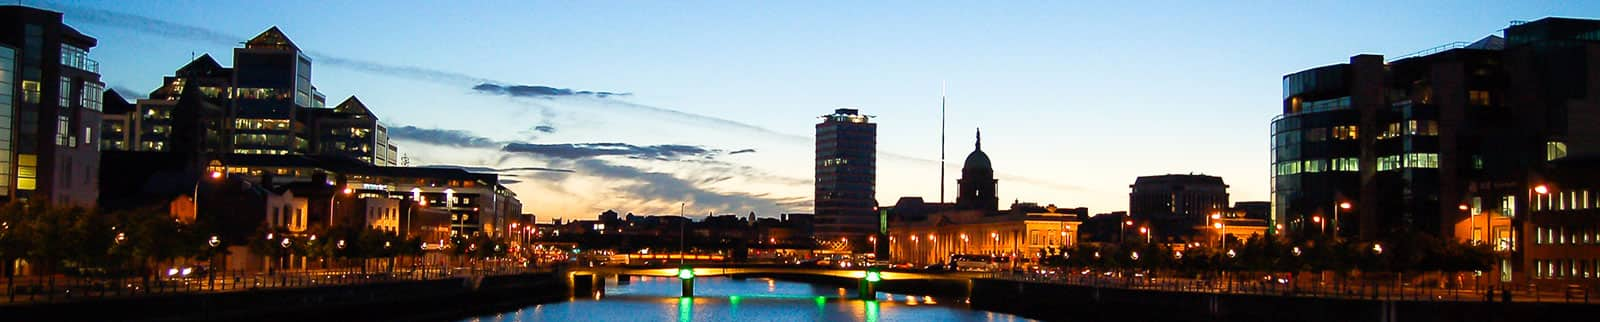 Dun Laoghaire Social Network (Dublin, Ireland) | Meetup